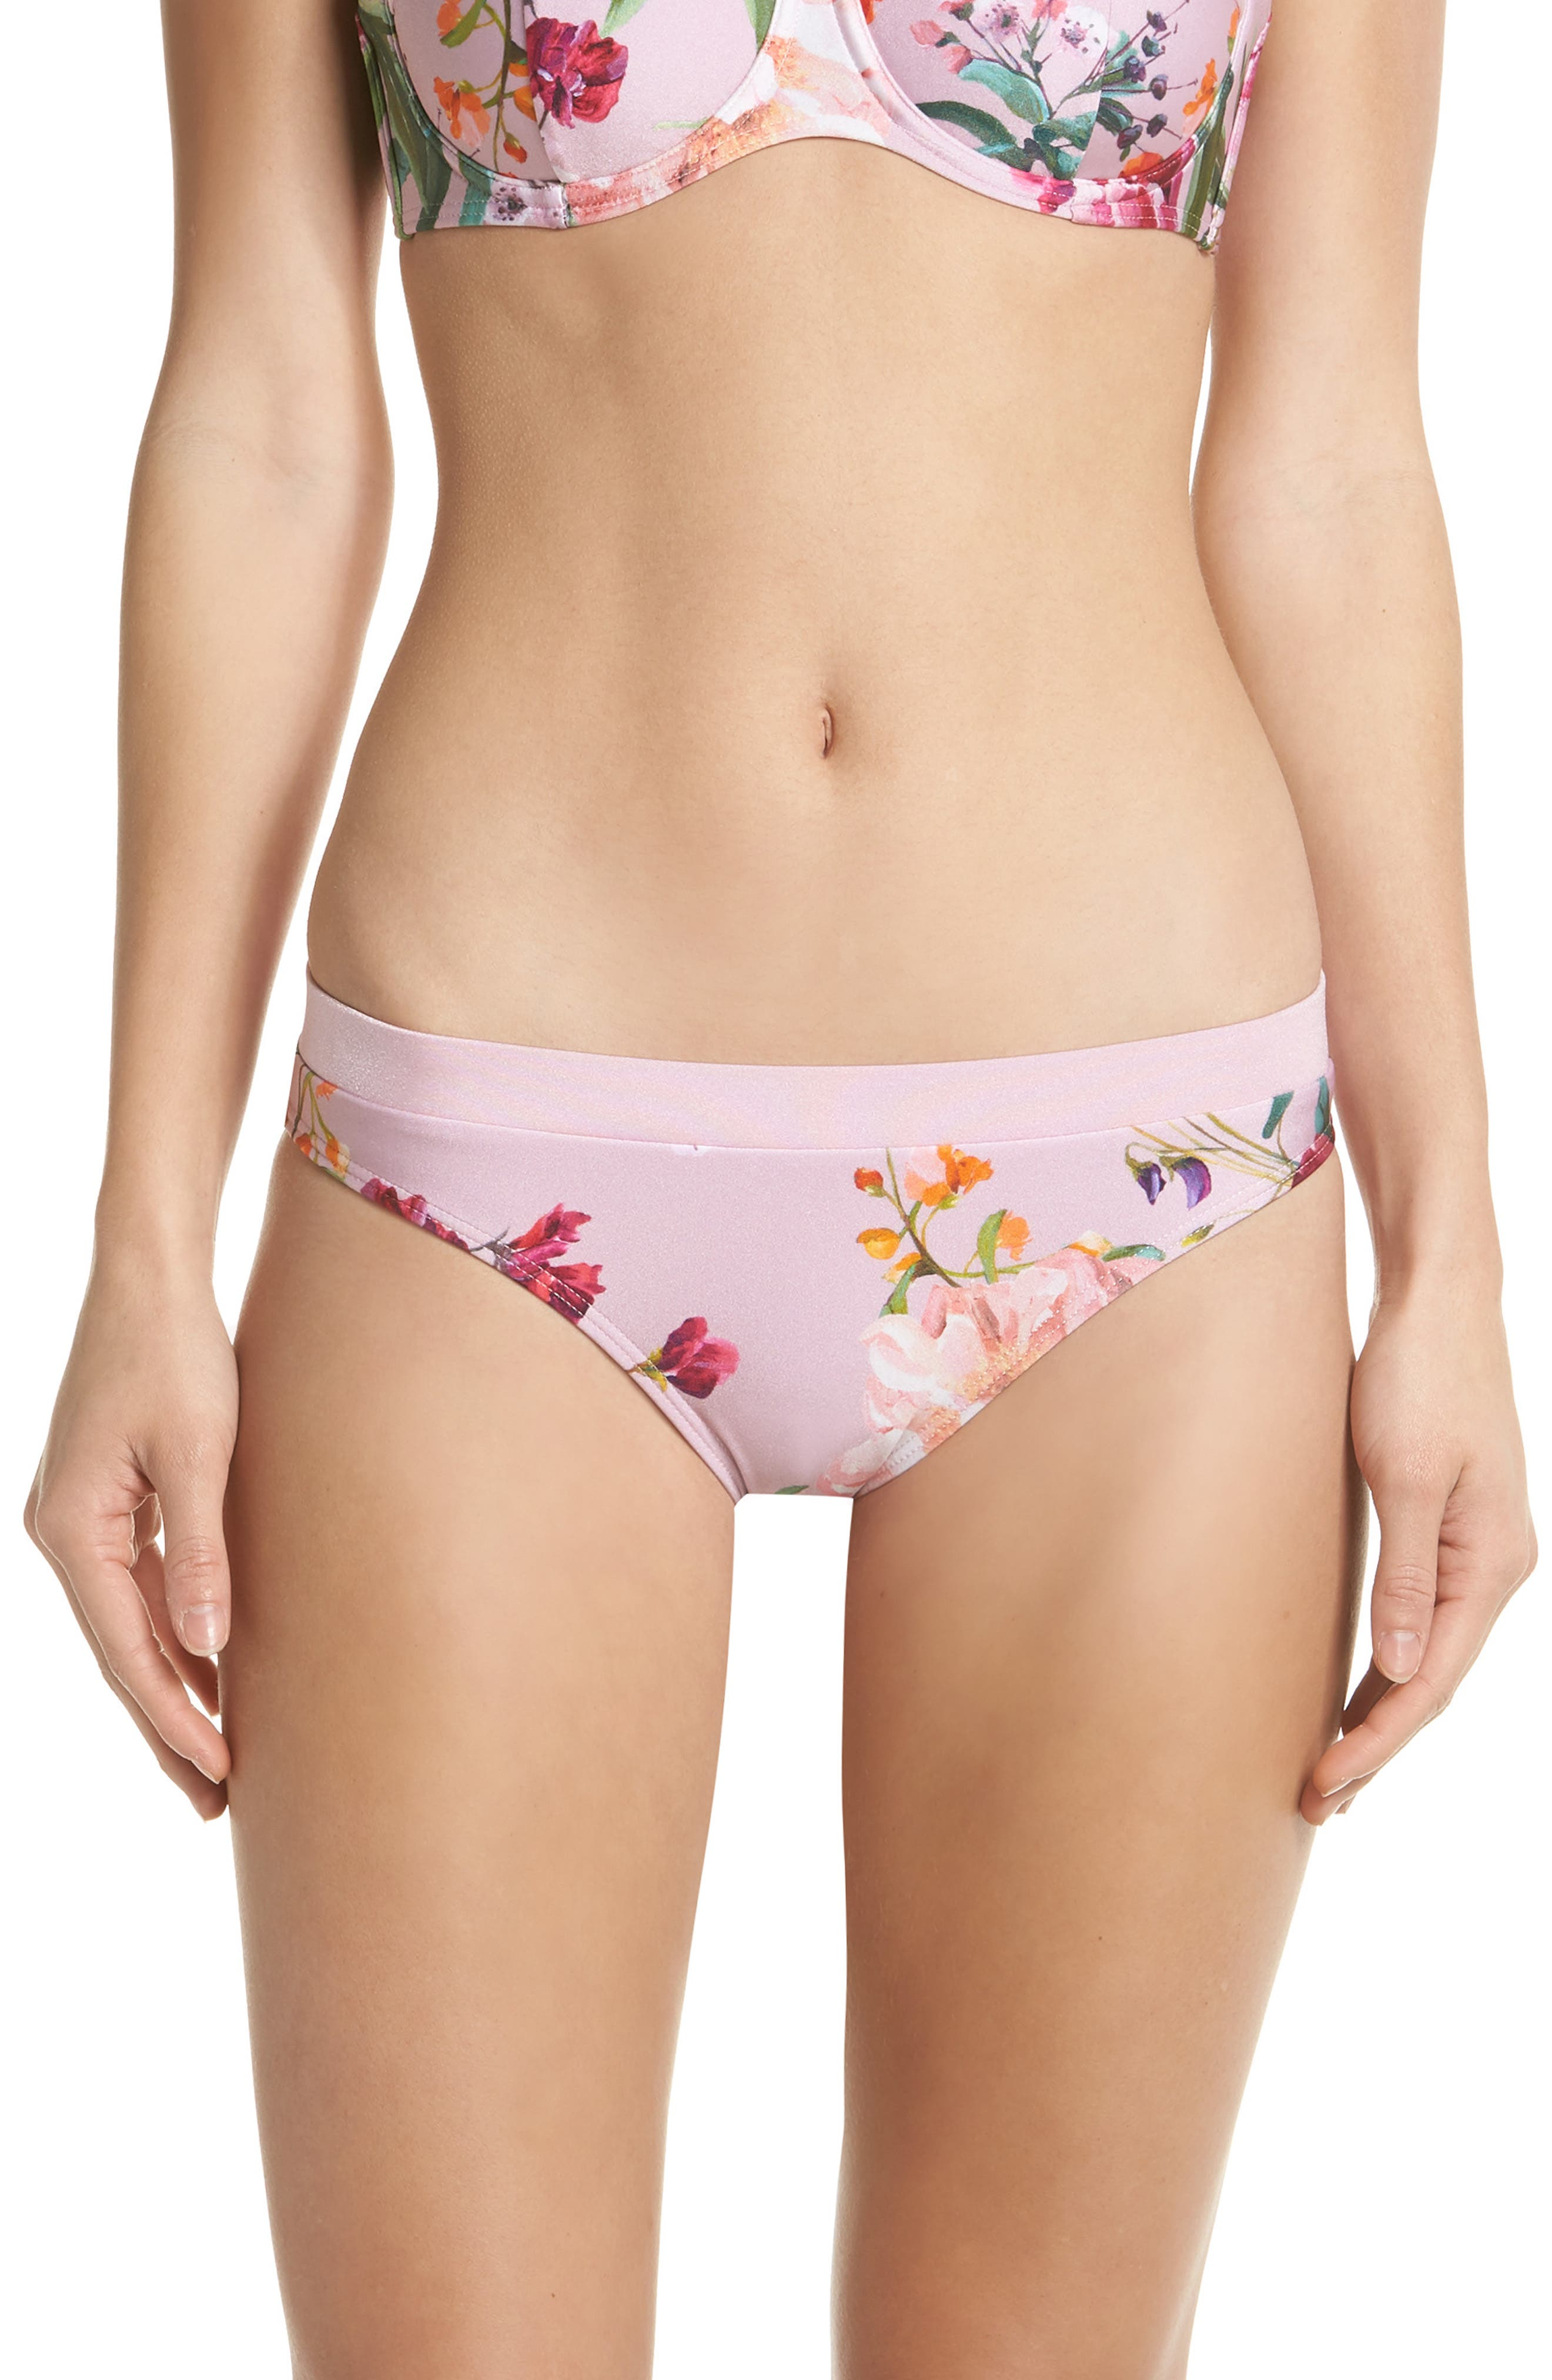 Serenity Floral Bikini Bottoms,                         Main,                         color, PALE PINK